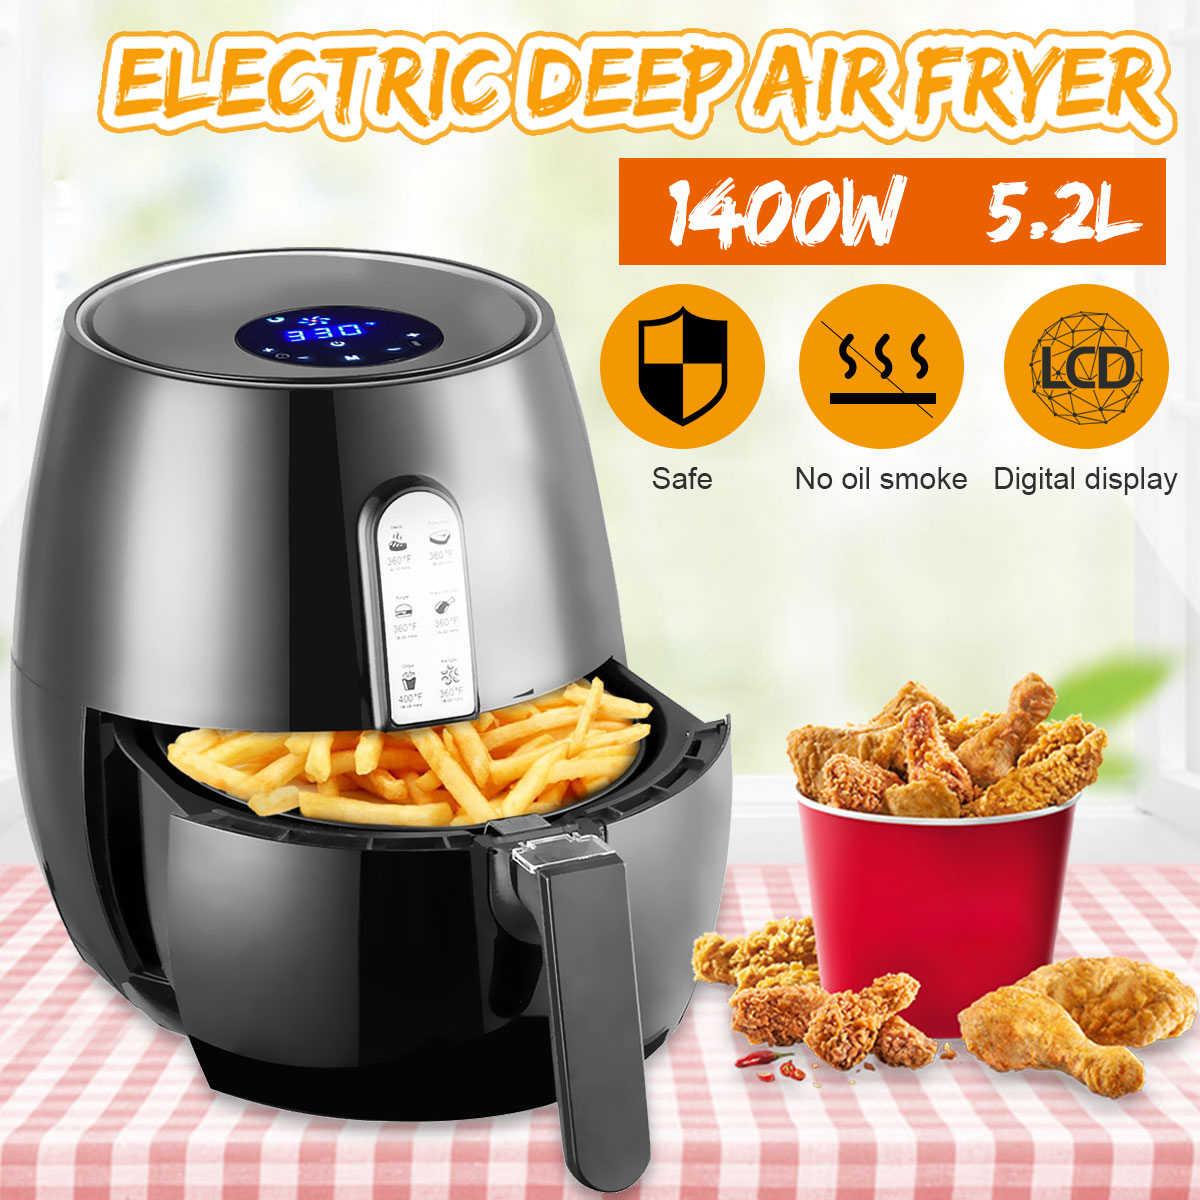 1400W 5.2L สุขภาพ Fryer หม้อหุงข้าวสมาร์ท Touch LCD Airfryer พิซซ่า Oil free Air Fryer หลายฟังก์ชั่นสมาร์ท Fryer สำหรับ french fries